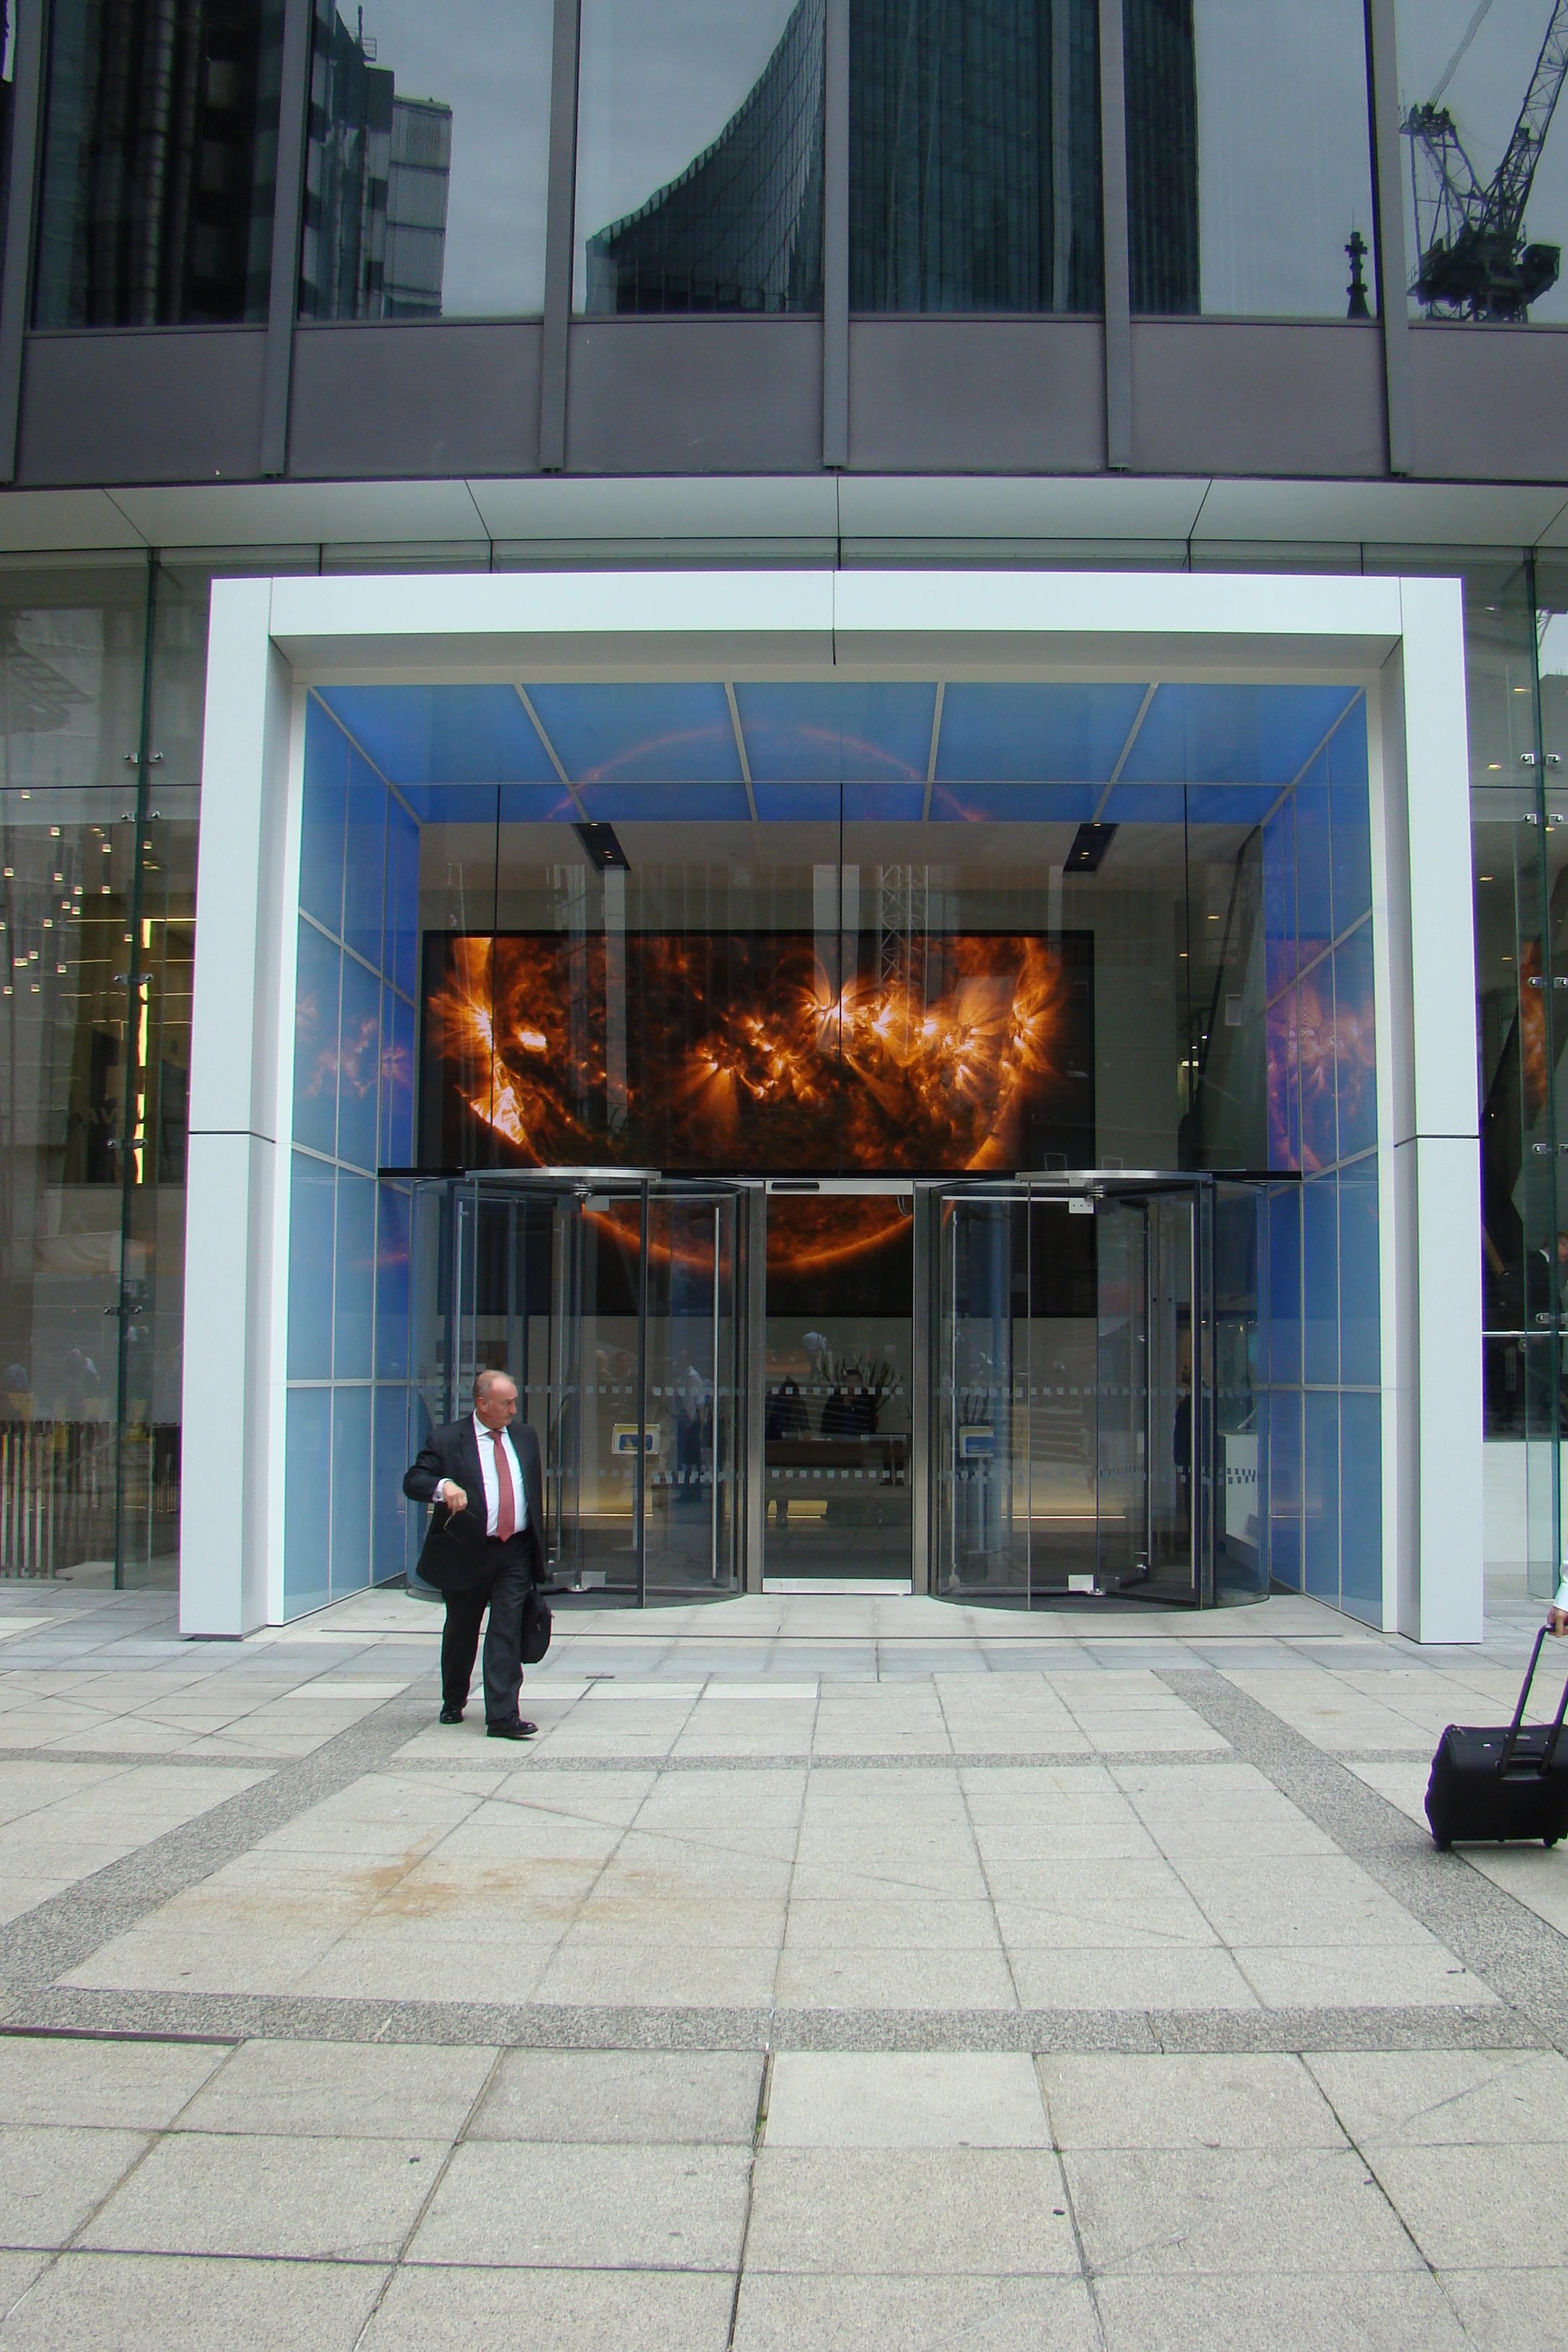 Sculpture in the City 2016, Londra - Petroc Sesti